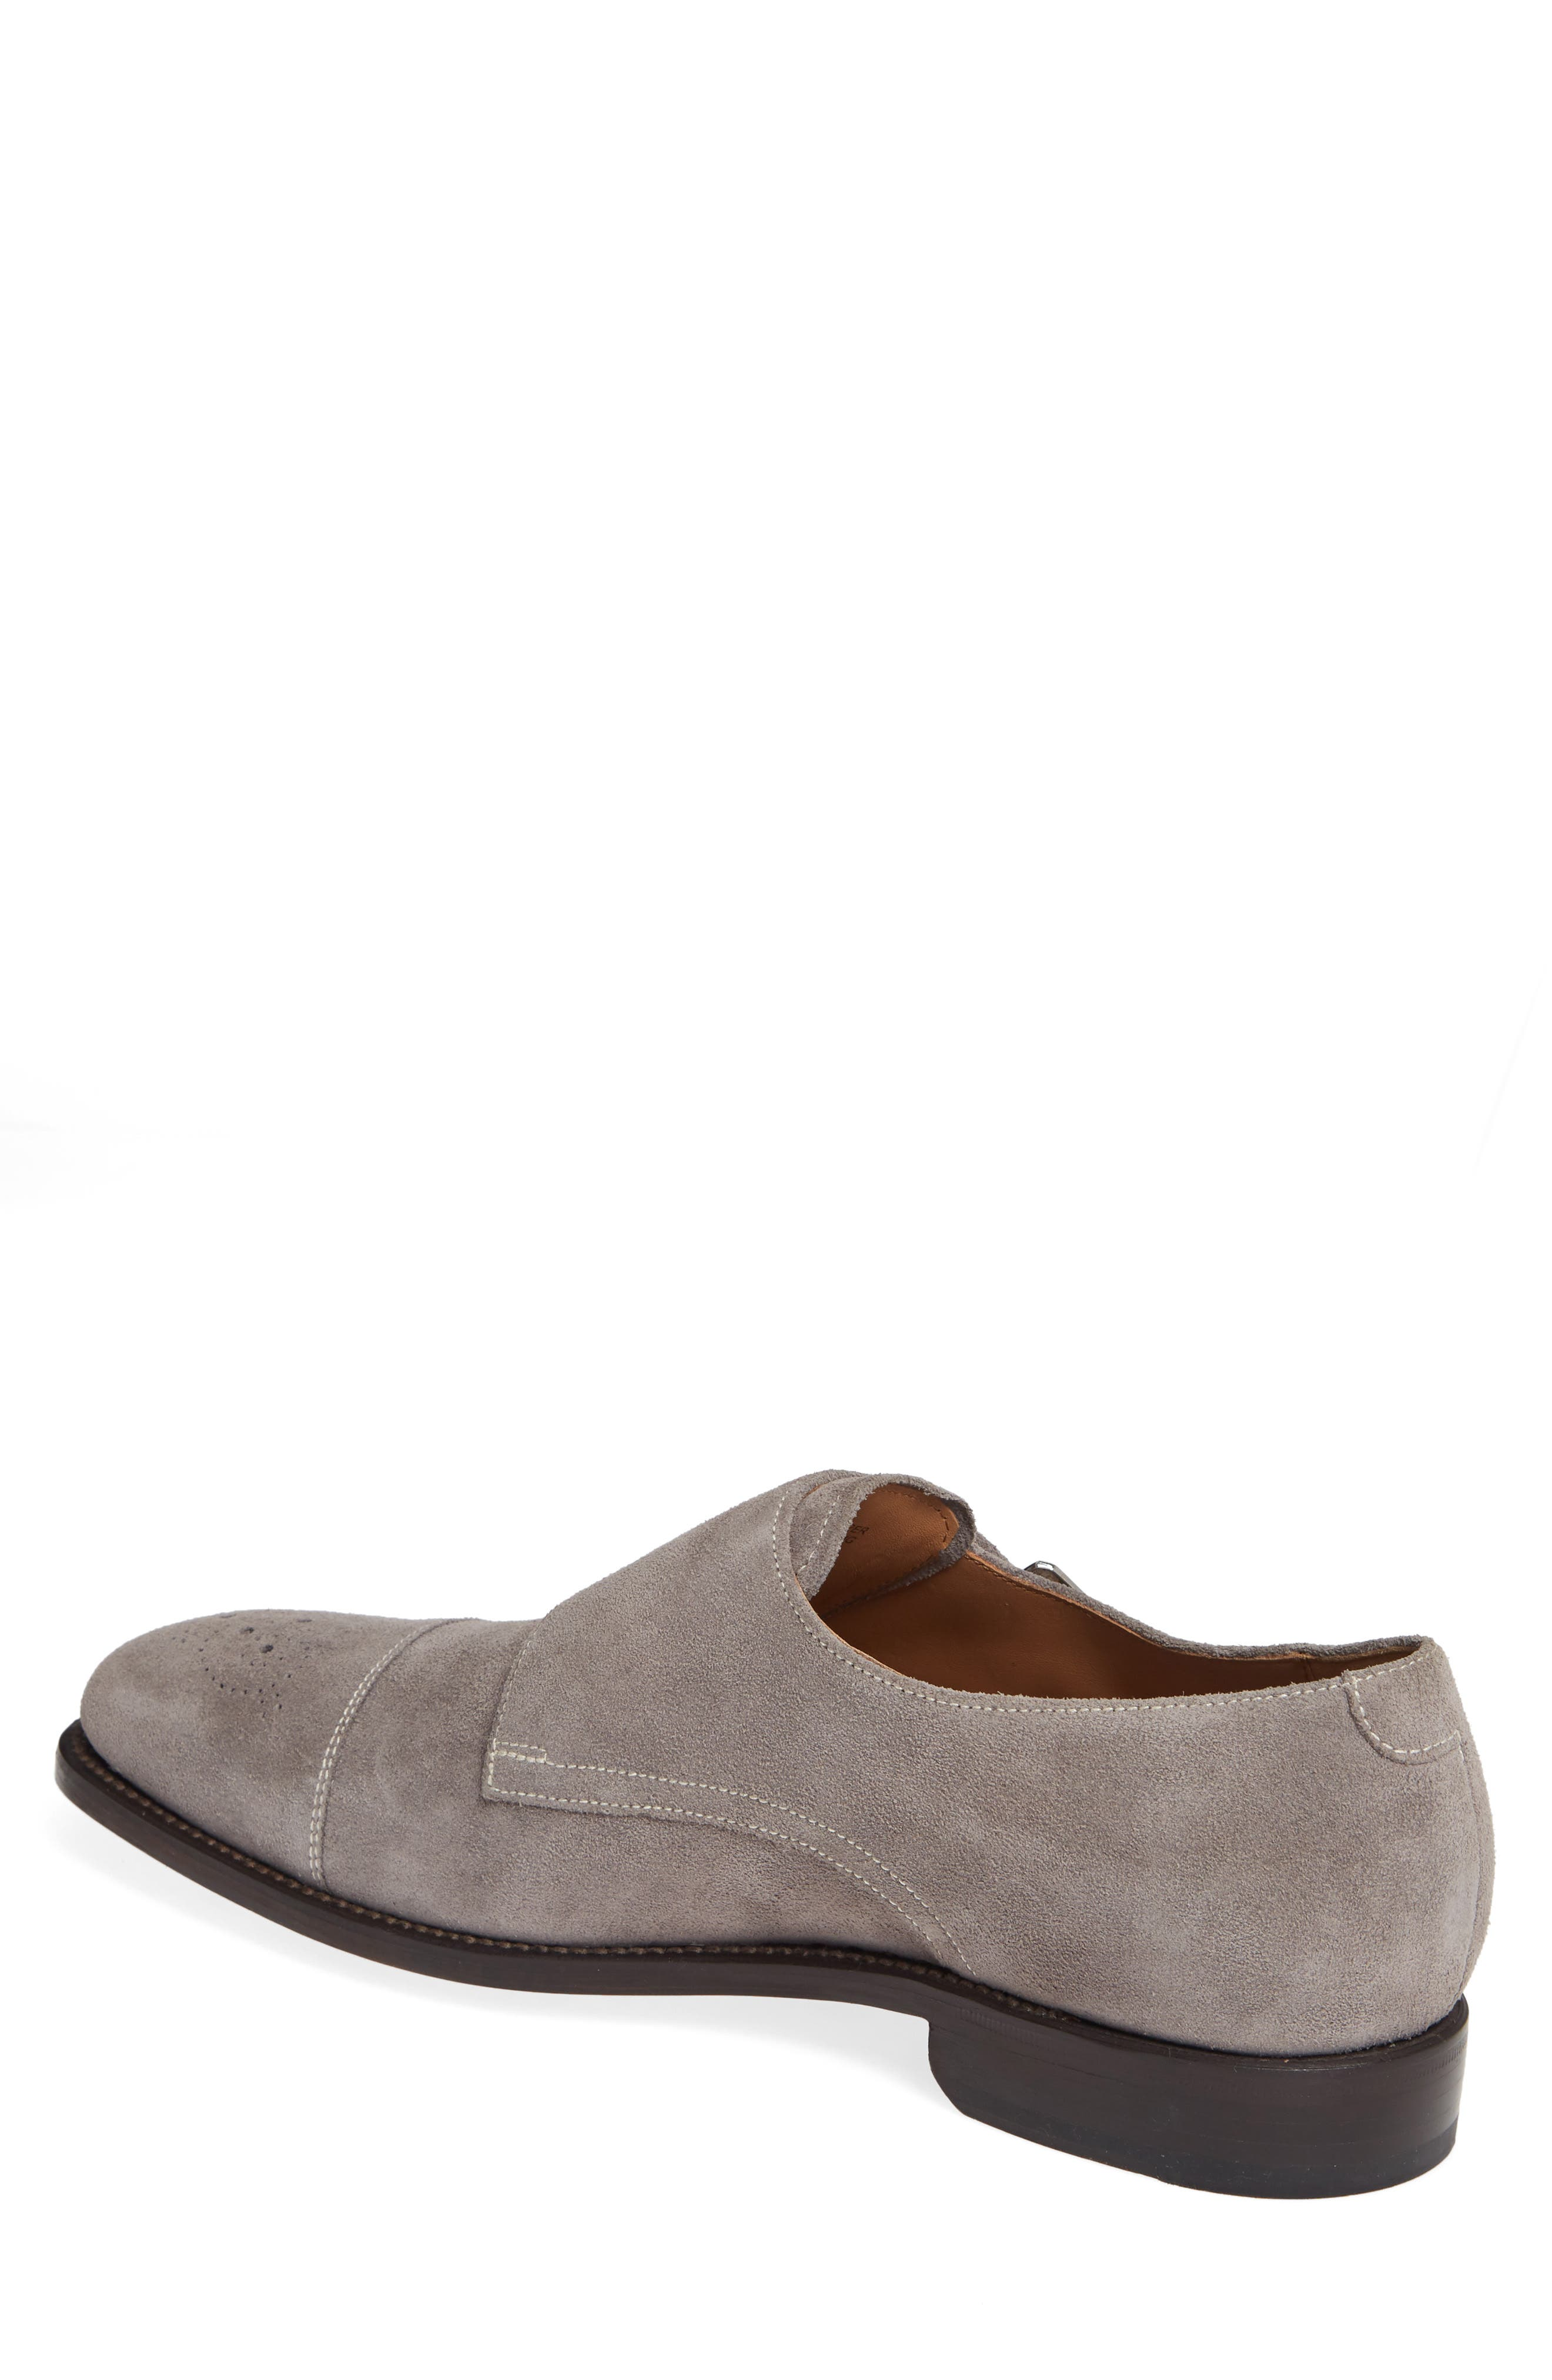 Sausalito Double Monk Strap Shoe,                             Alternate thumbnail 2, color,                             GREY SUEDE